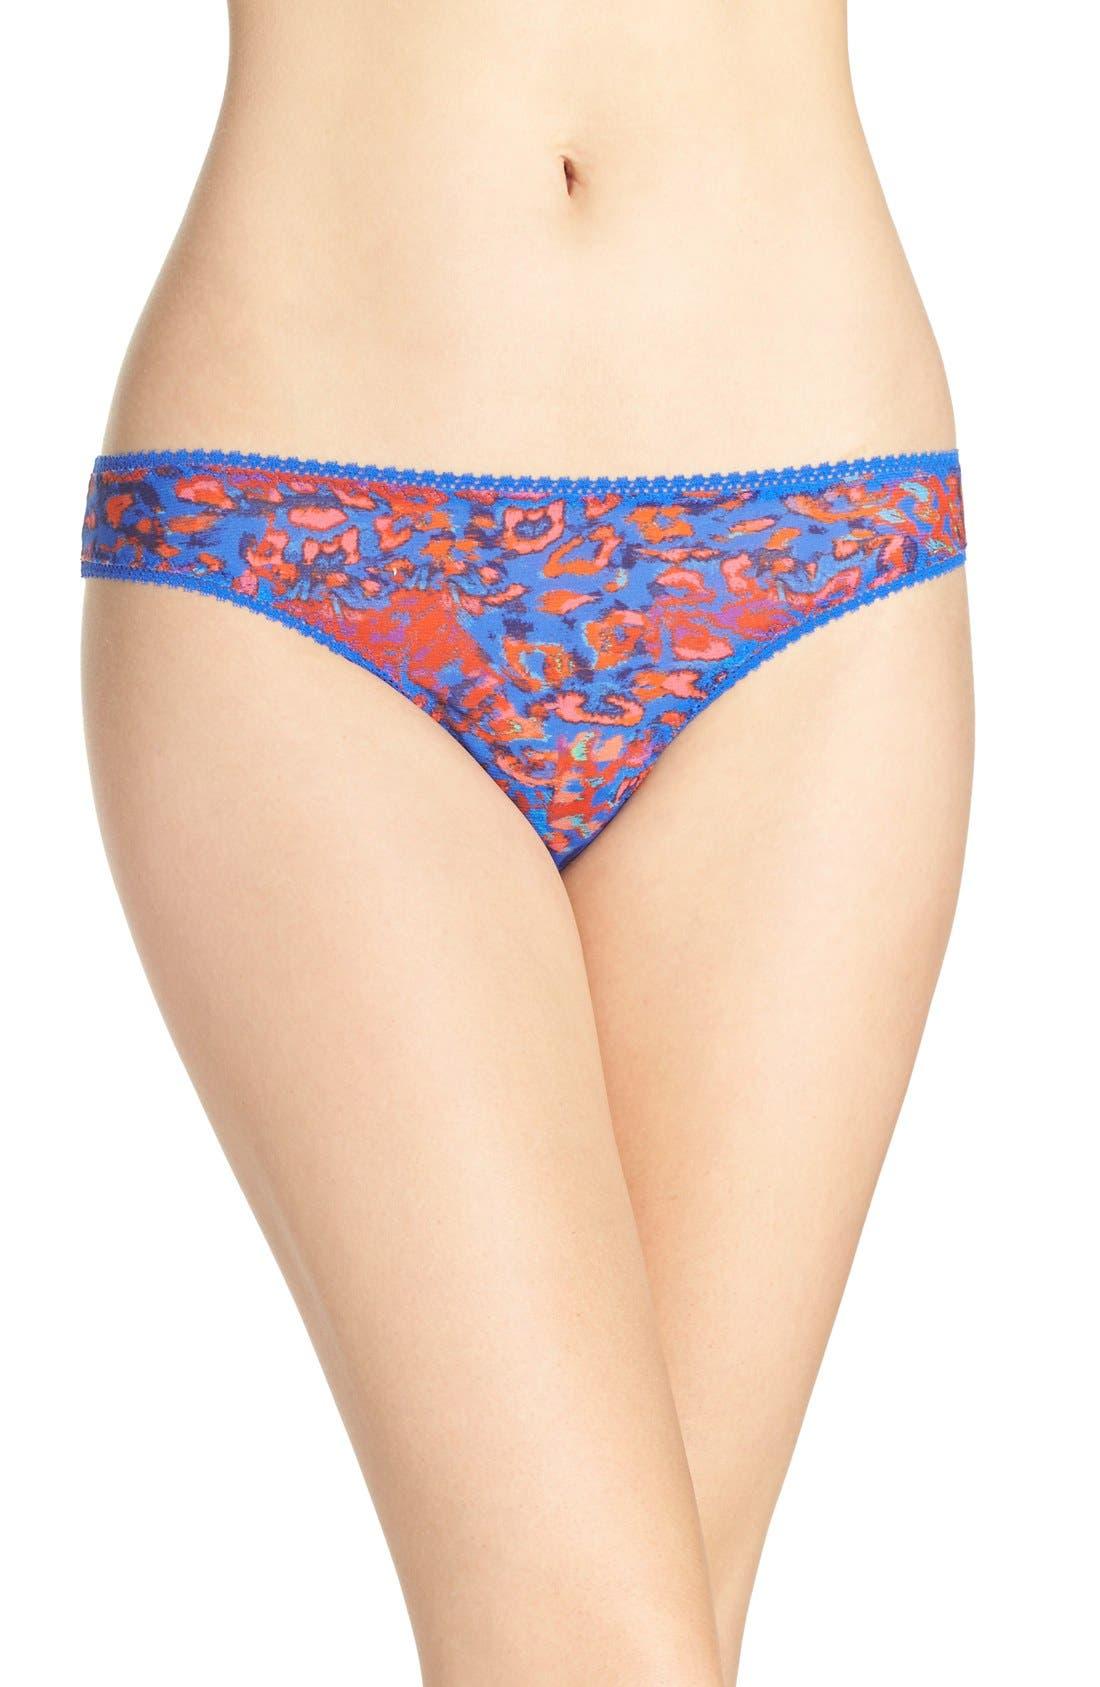 Alternate Image 1 Selected - On Gossamer 'Triple Twist' Bikini (3 for $45)